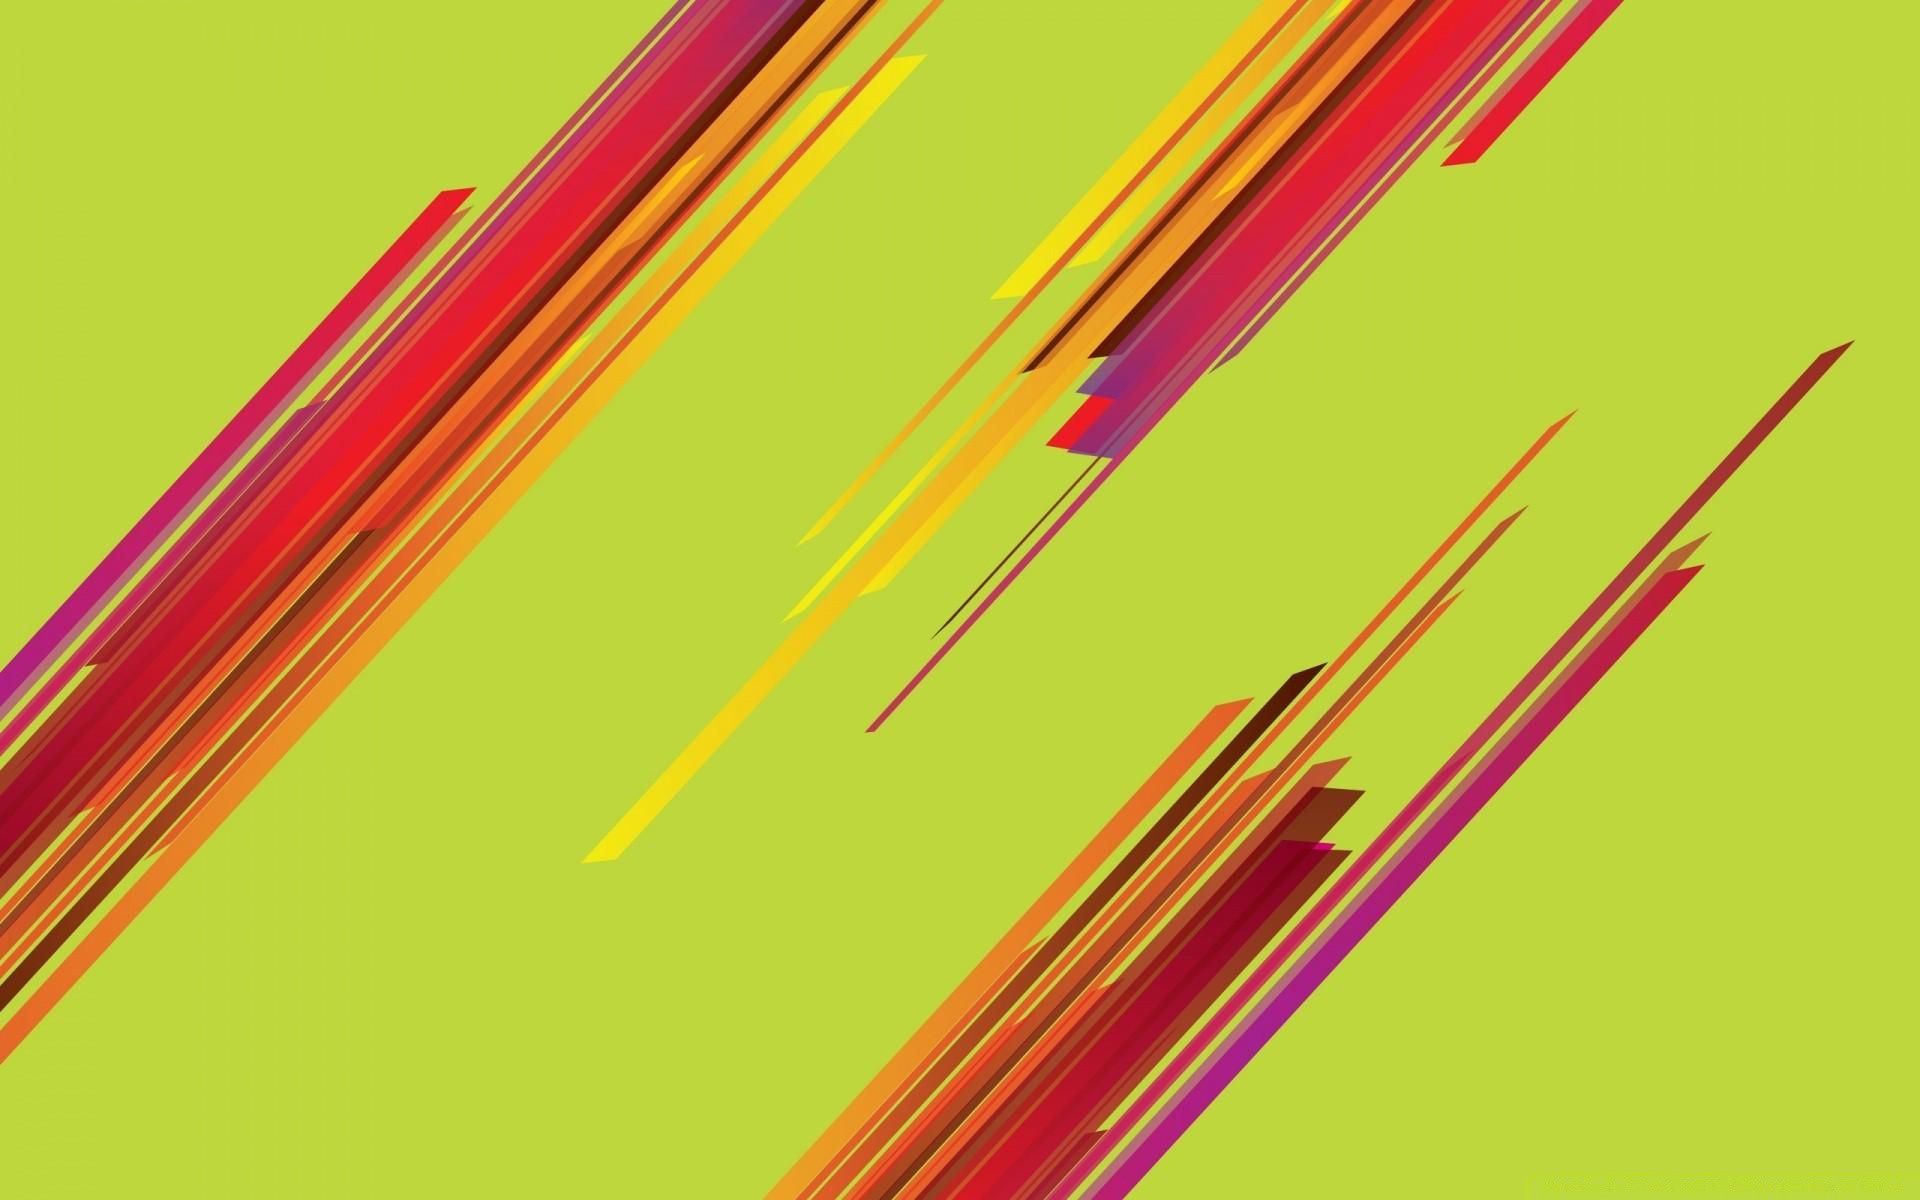 Vector Art Art Artistic Abstract Illustration Design - Vector Wallpaper Free Download - HD Wallpaper